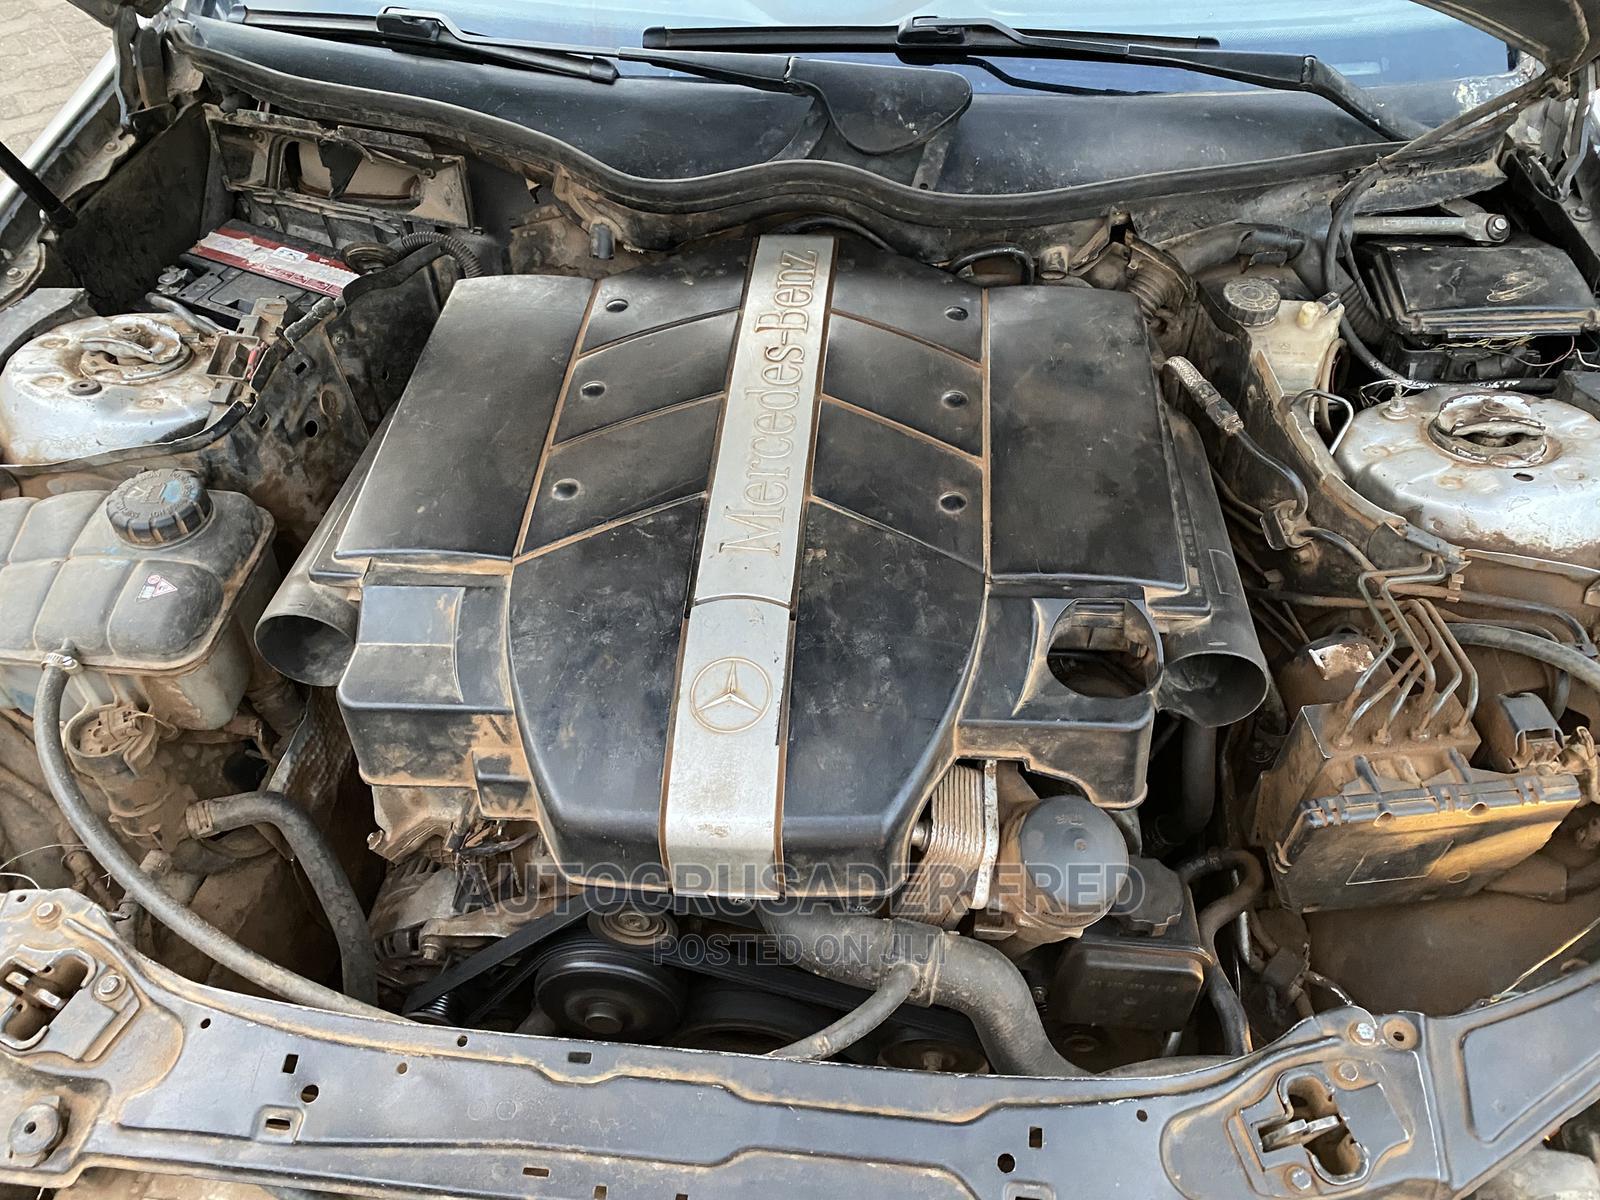 Archive: Mercedes-Benz C240 2005 Silver